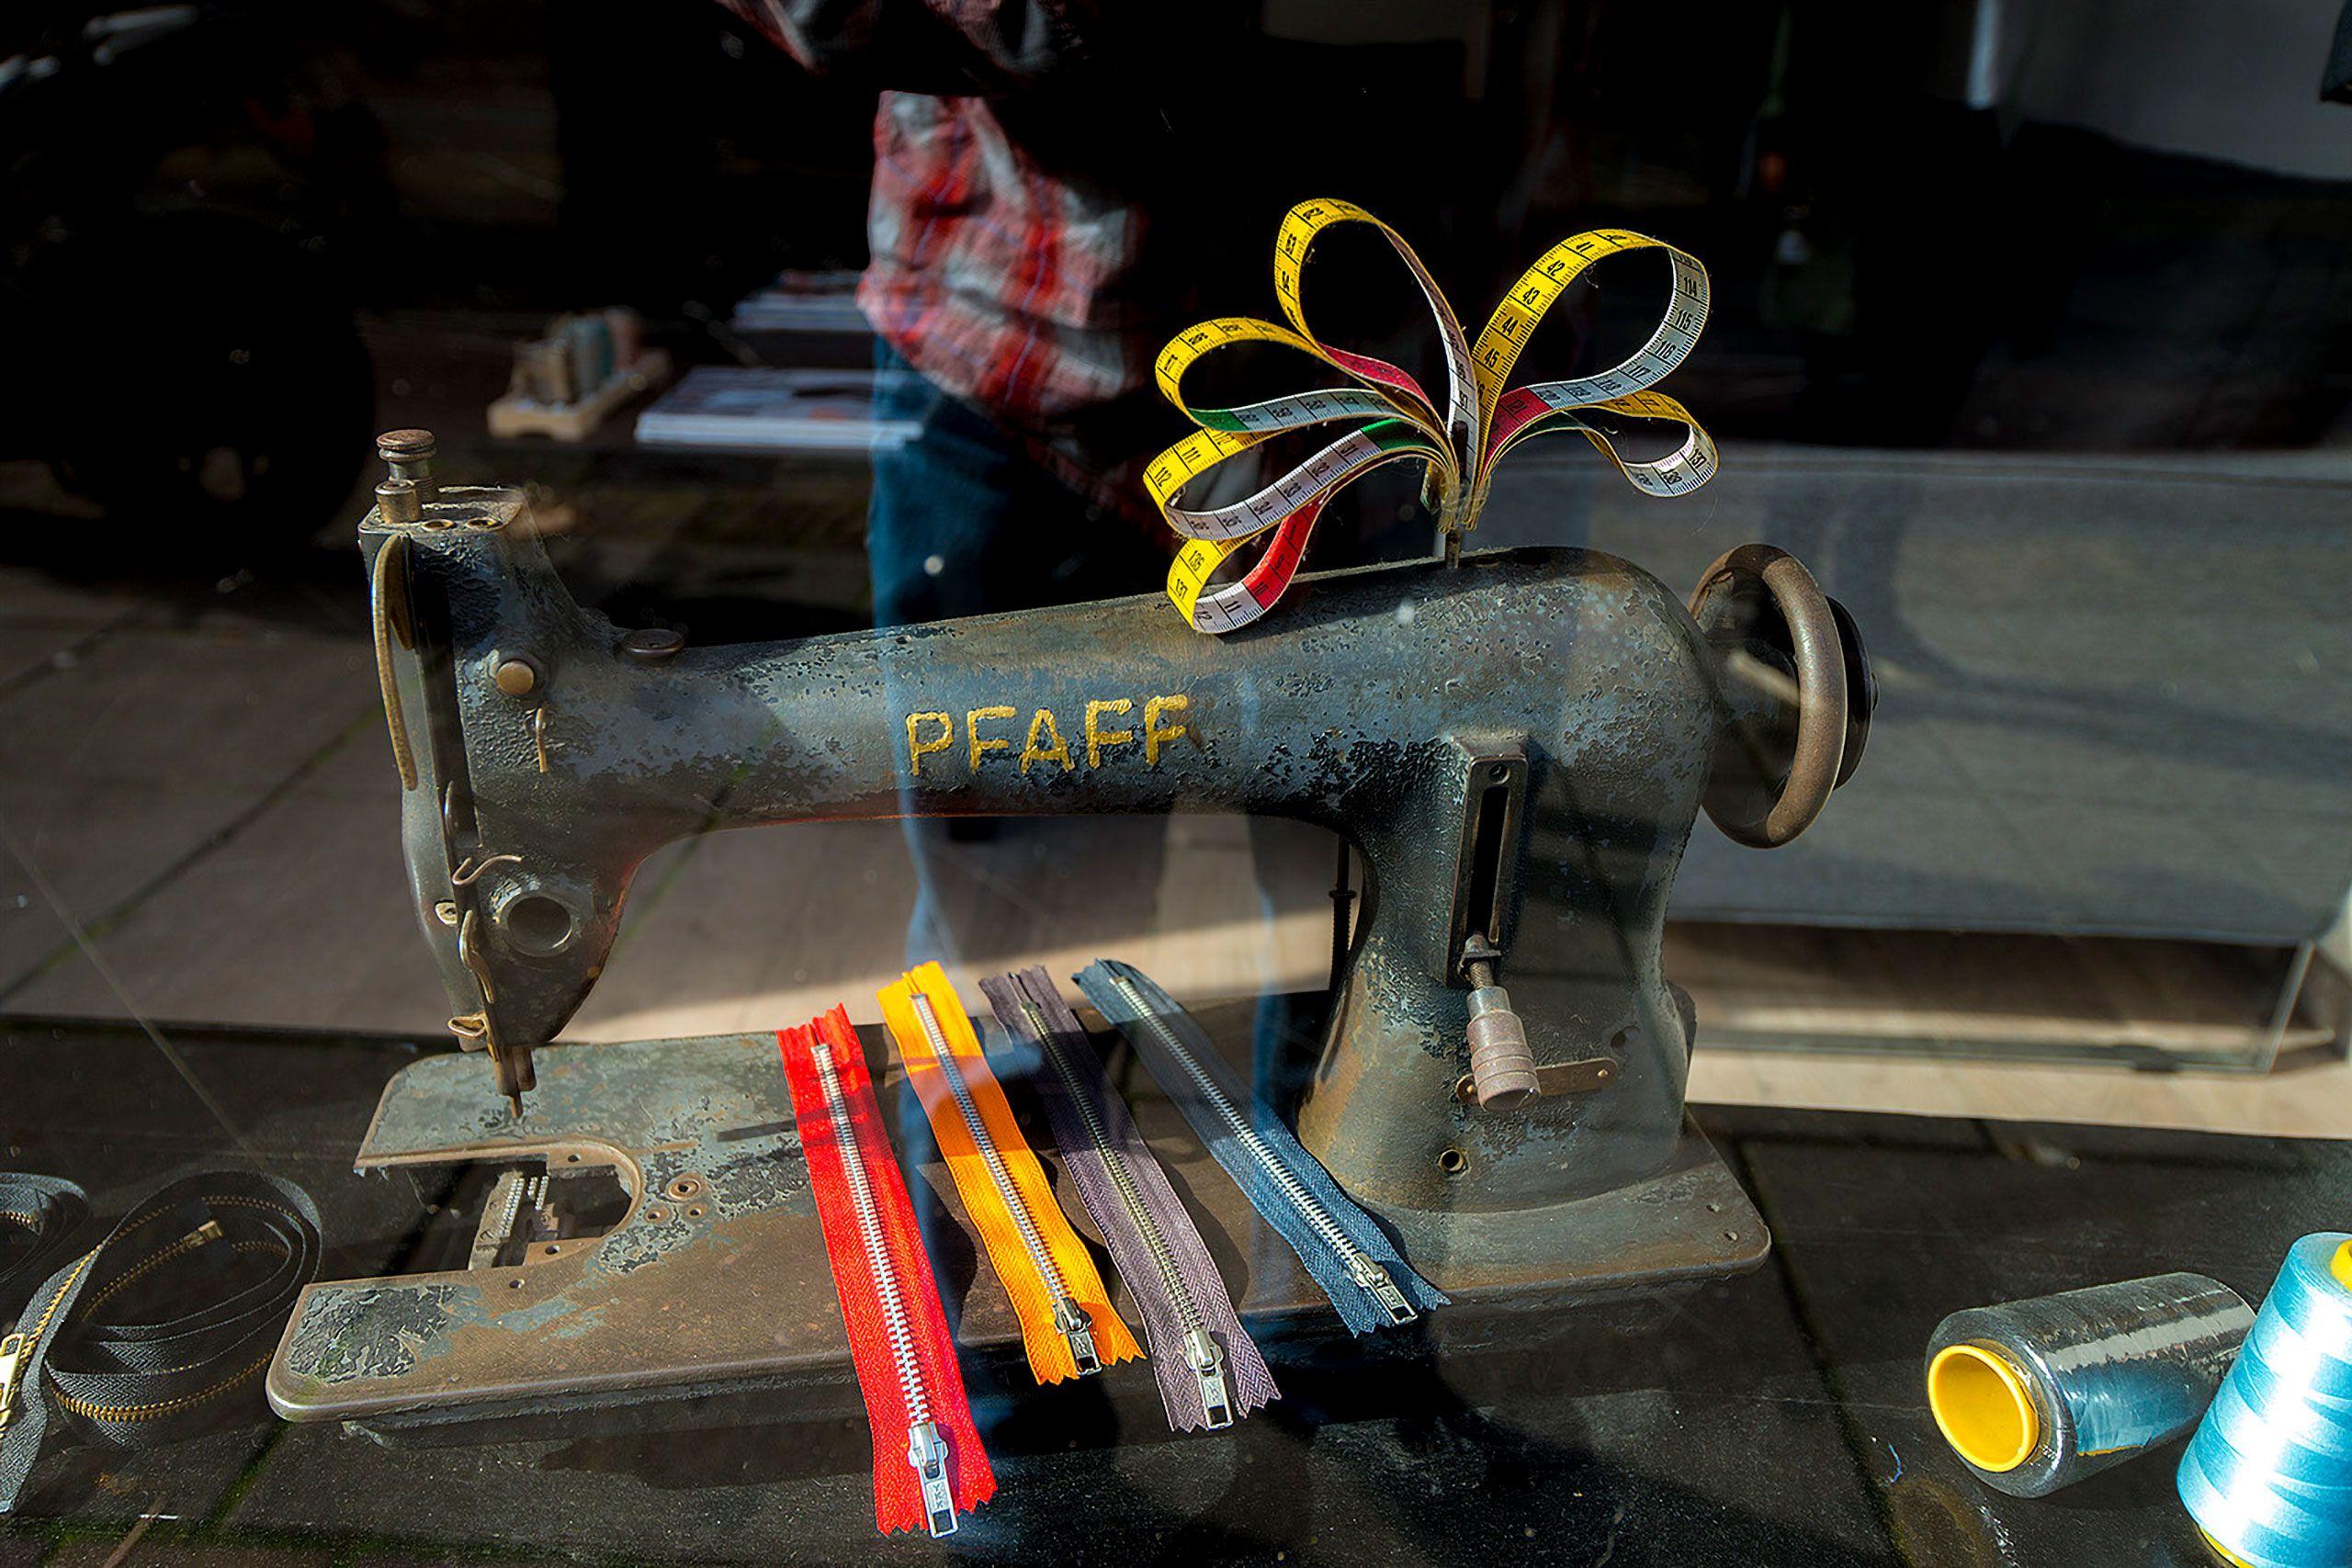 Shop window in Amsterdam  old Praff sewing machine